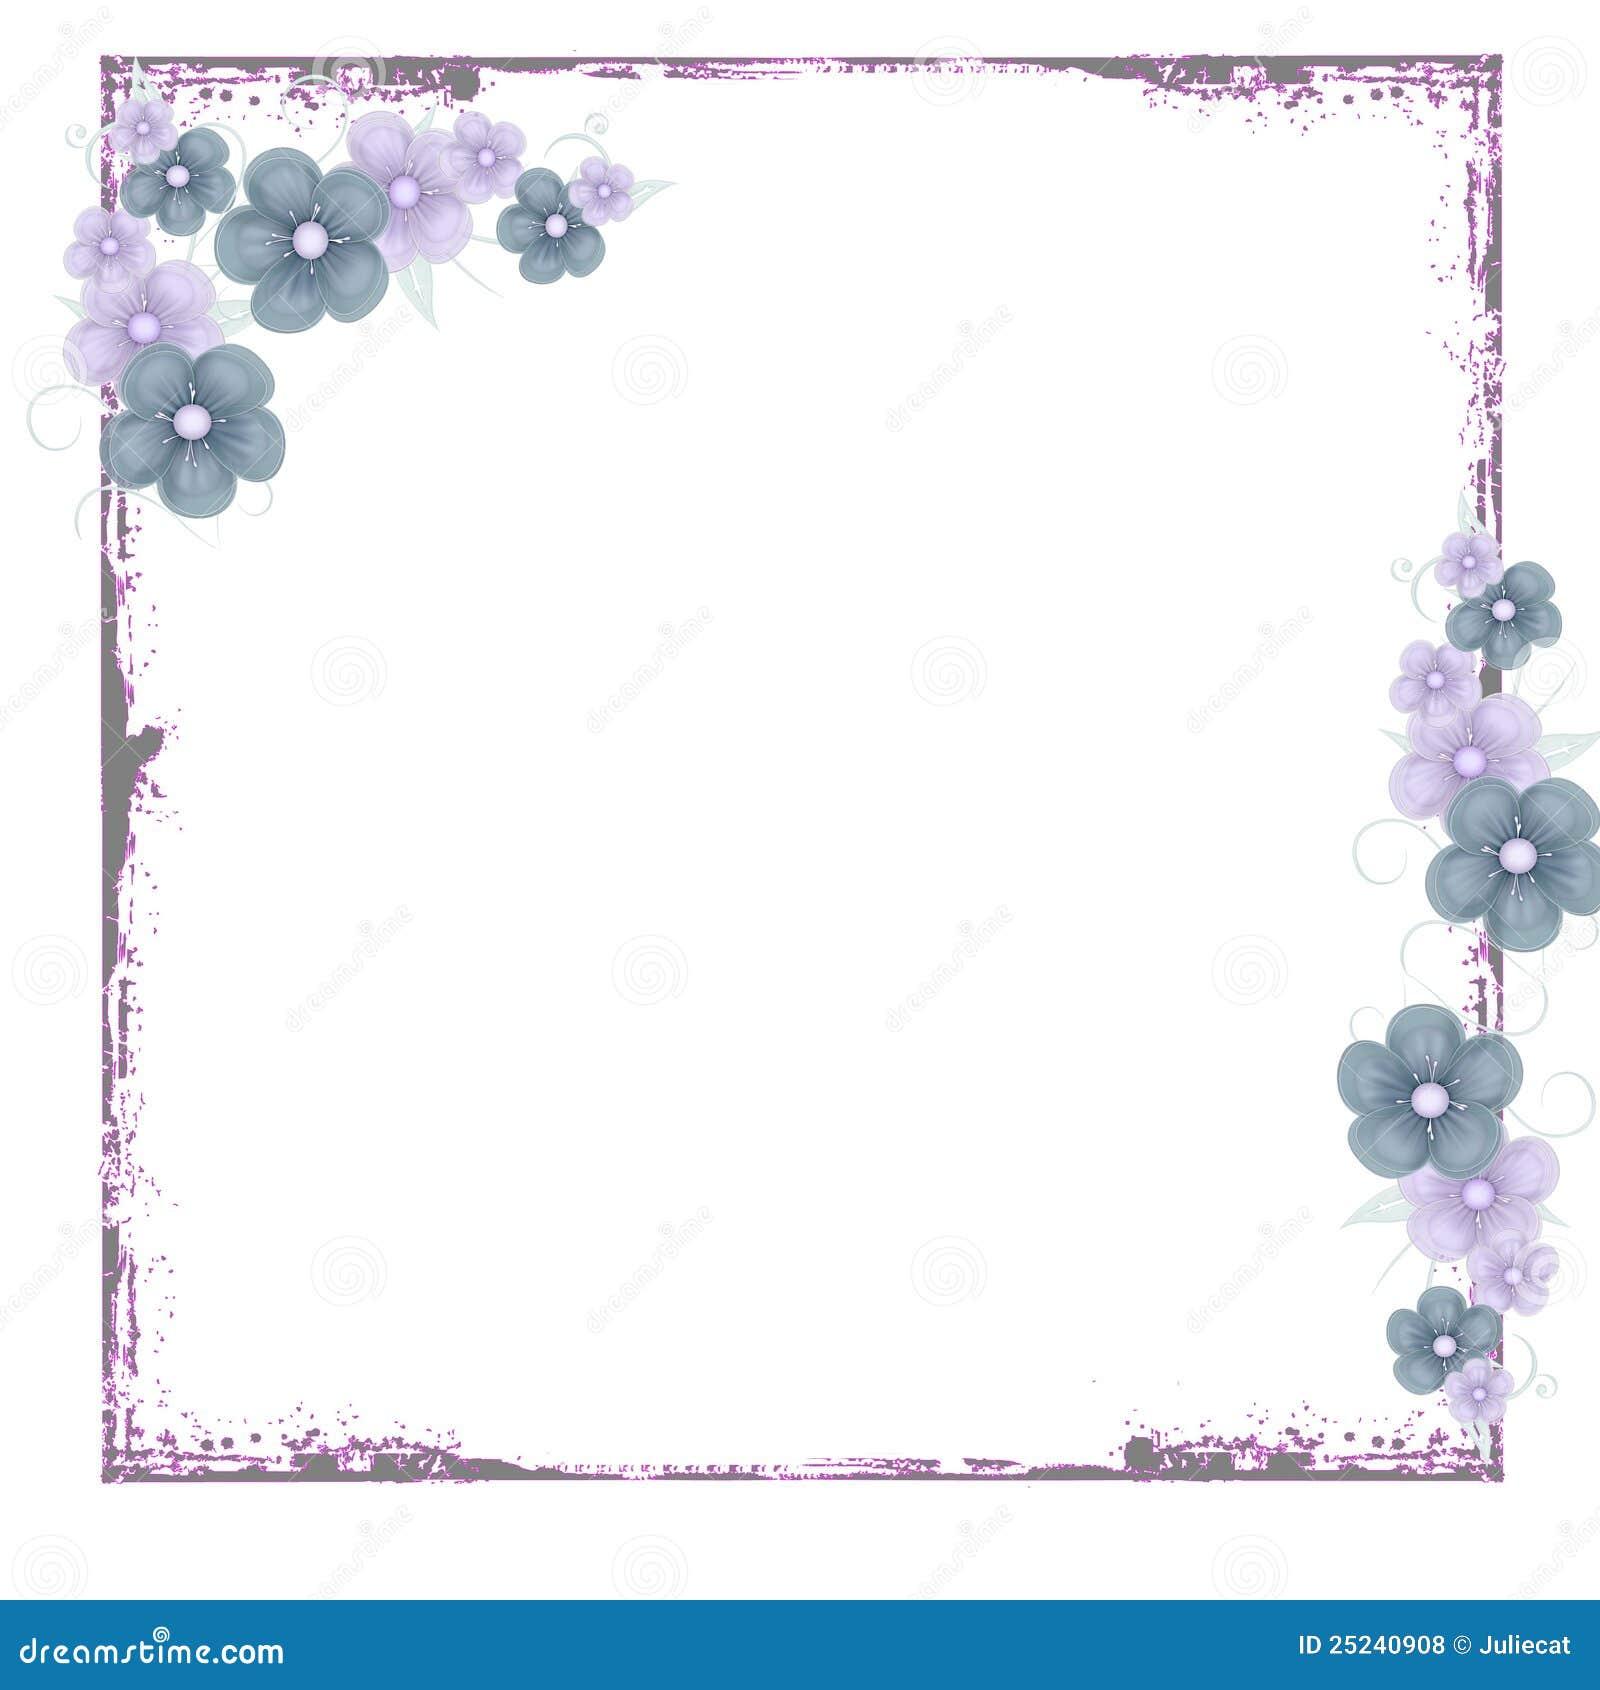 https://thumbs.dreamstime.com/z/grey-lilac-mauve-floral-frame-25240908.jpg